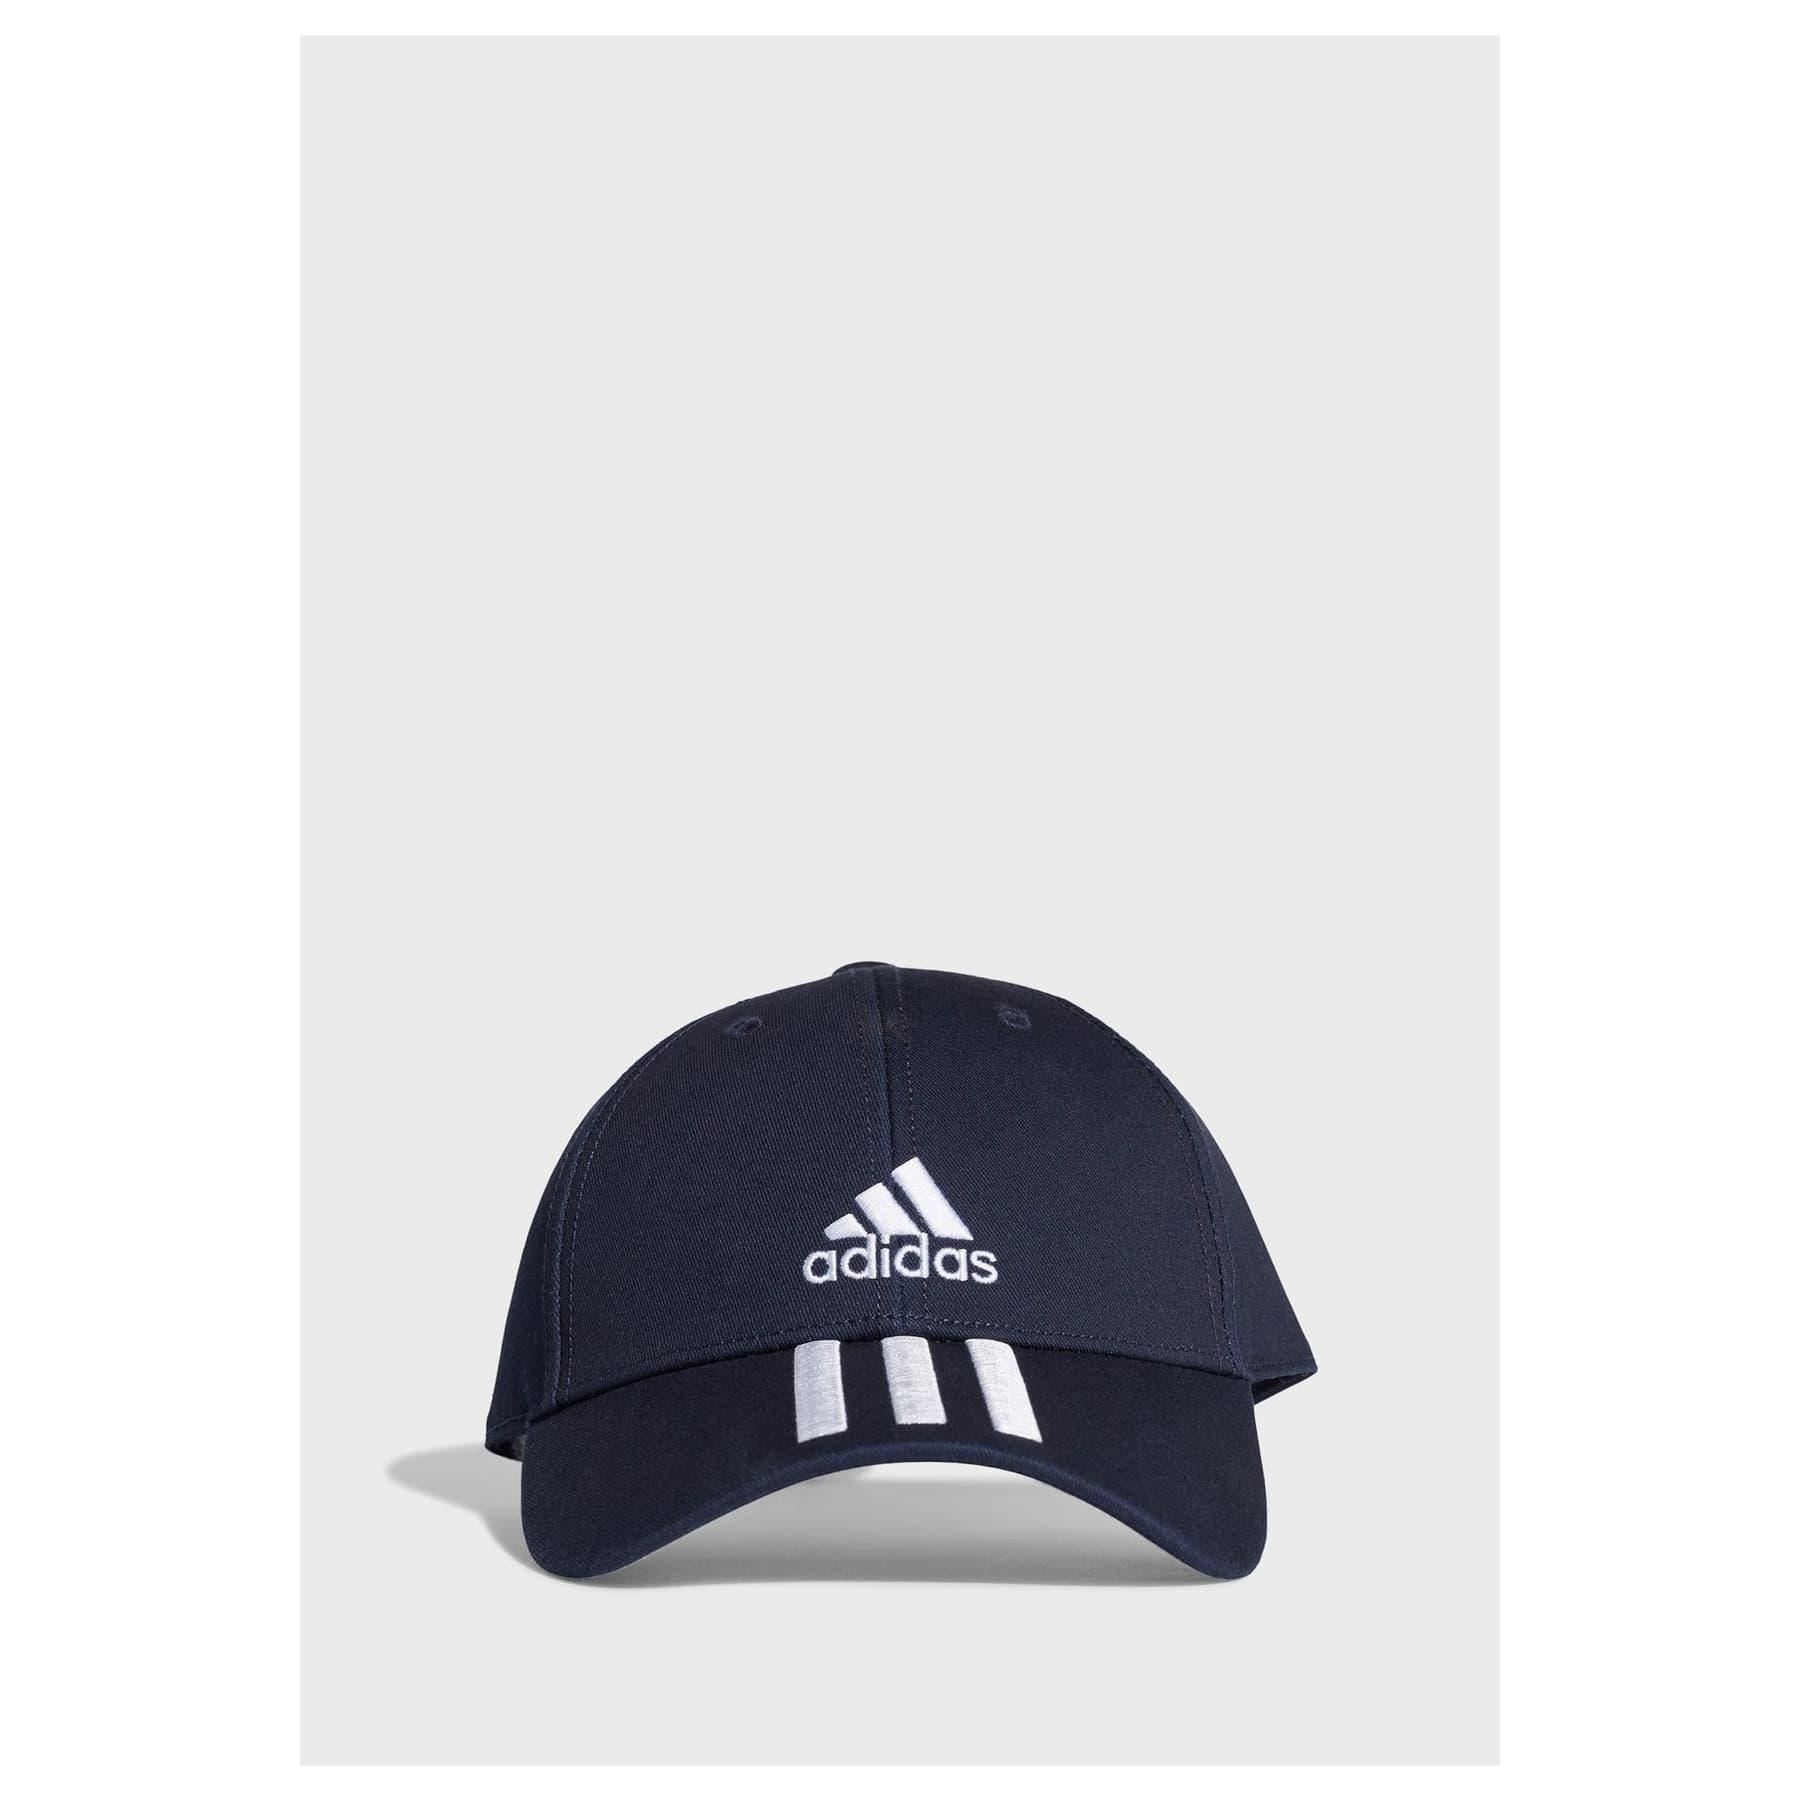 3-Stripes Twill Mavi Beyzbol Şapkası (GE0750)